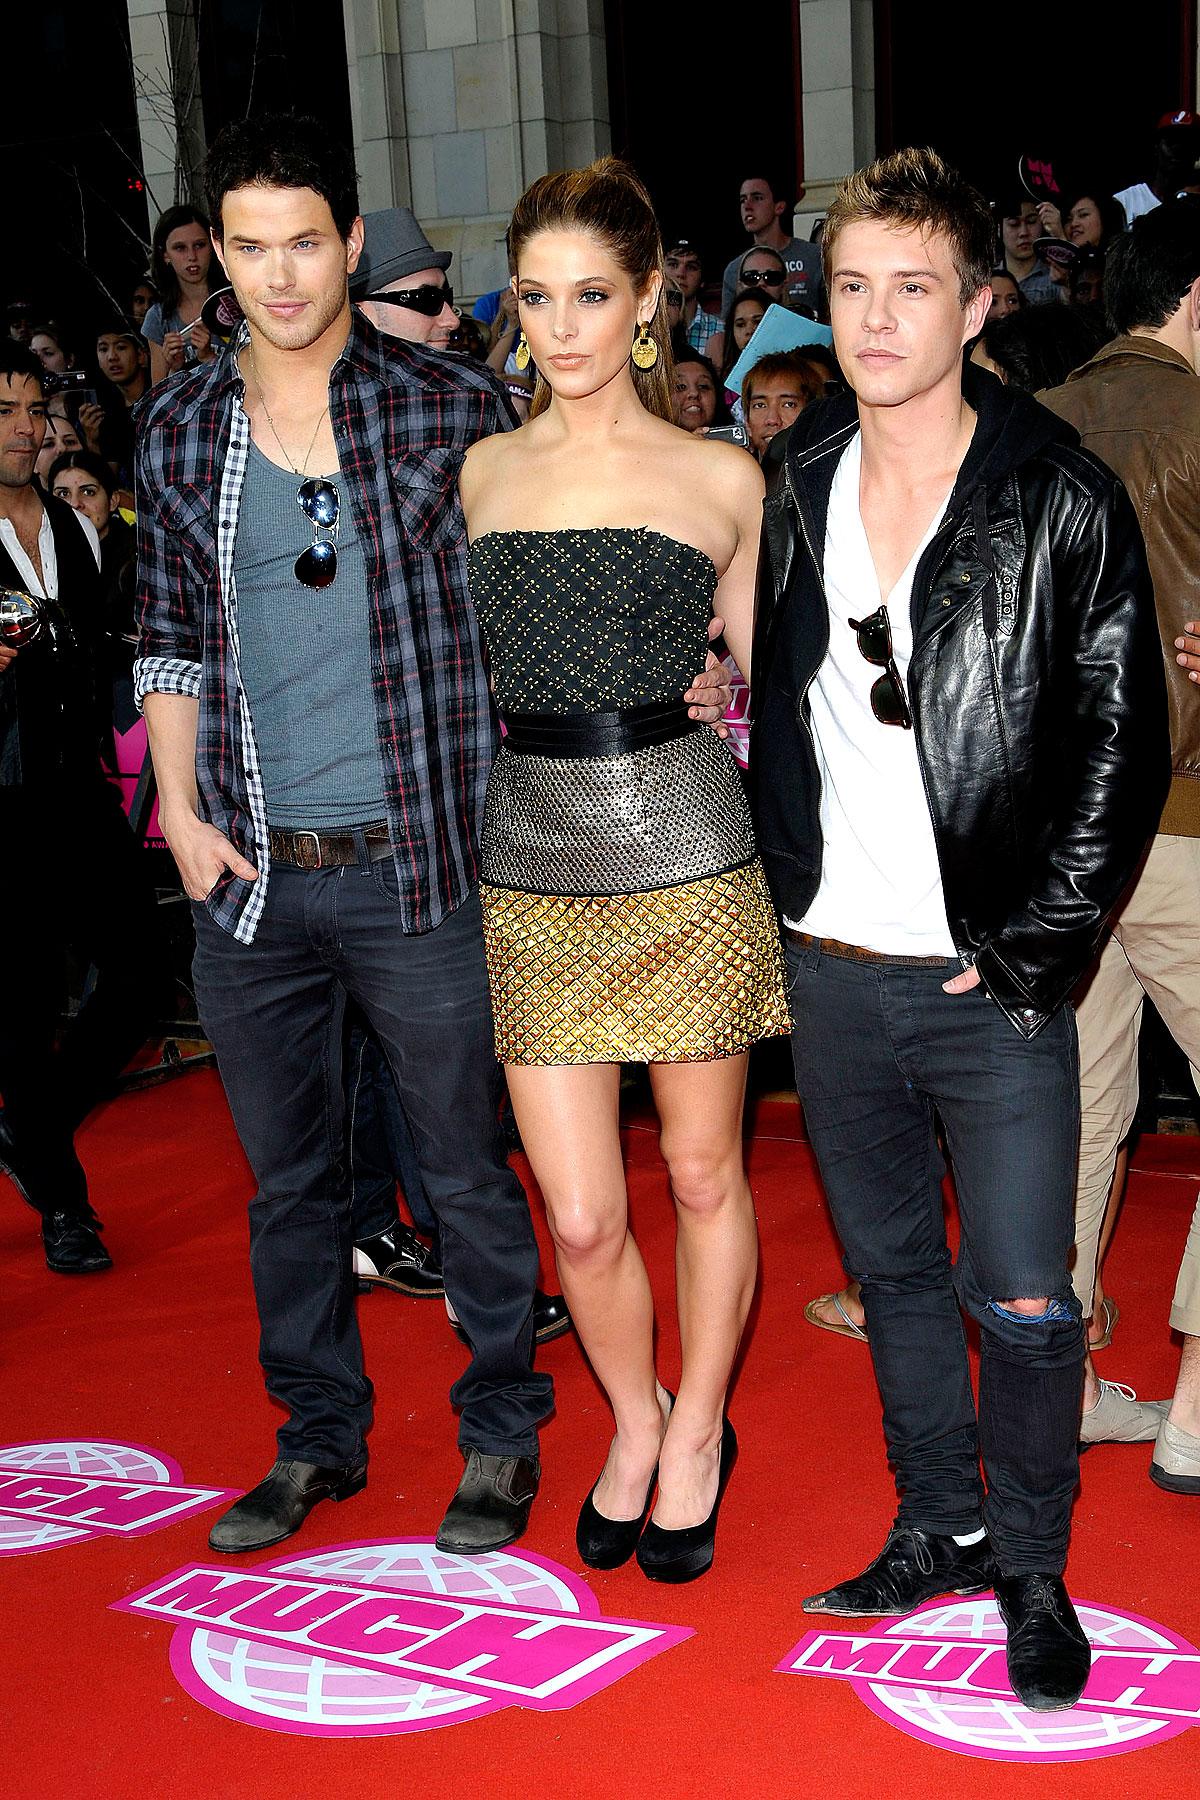 Fashion FAILs & FTWs Of The 2010 MuchMusic Video Awards (PHOTOS)